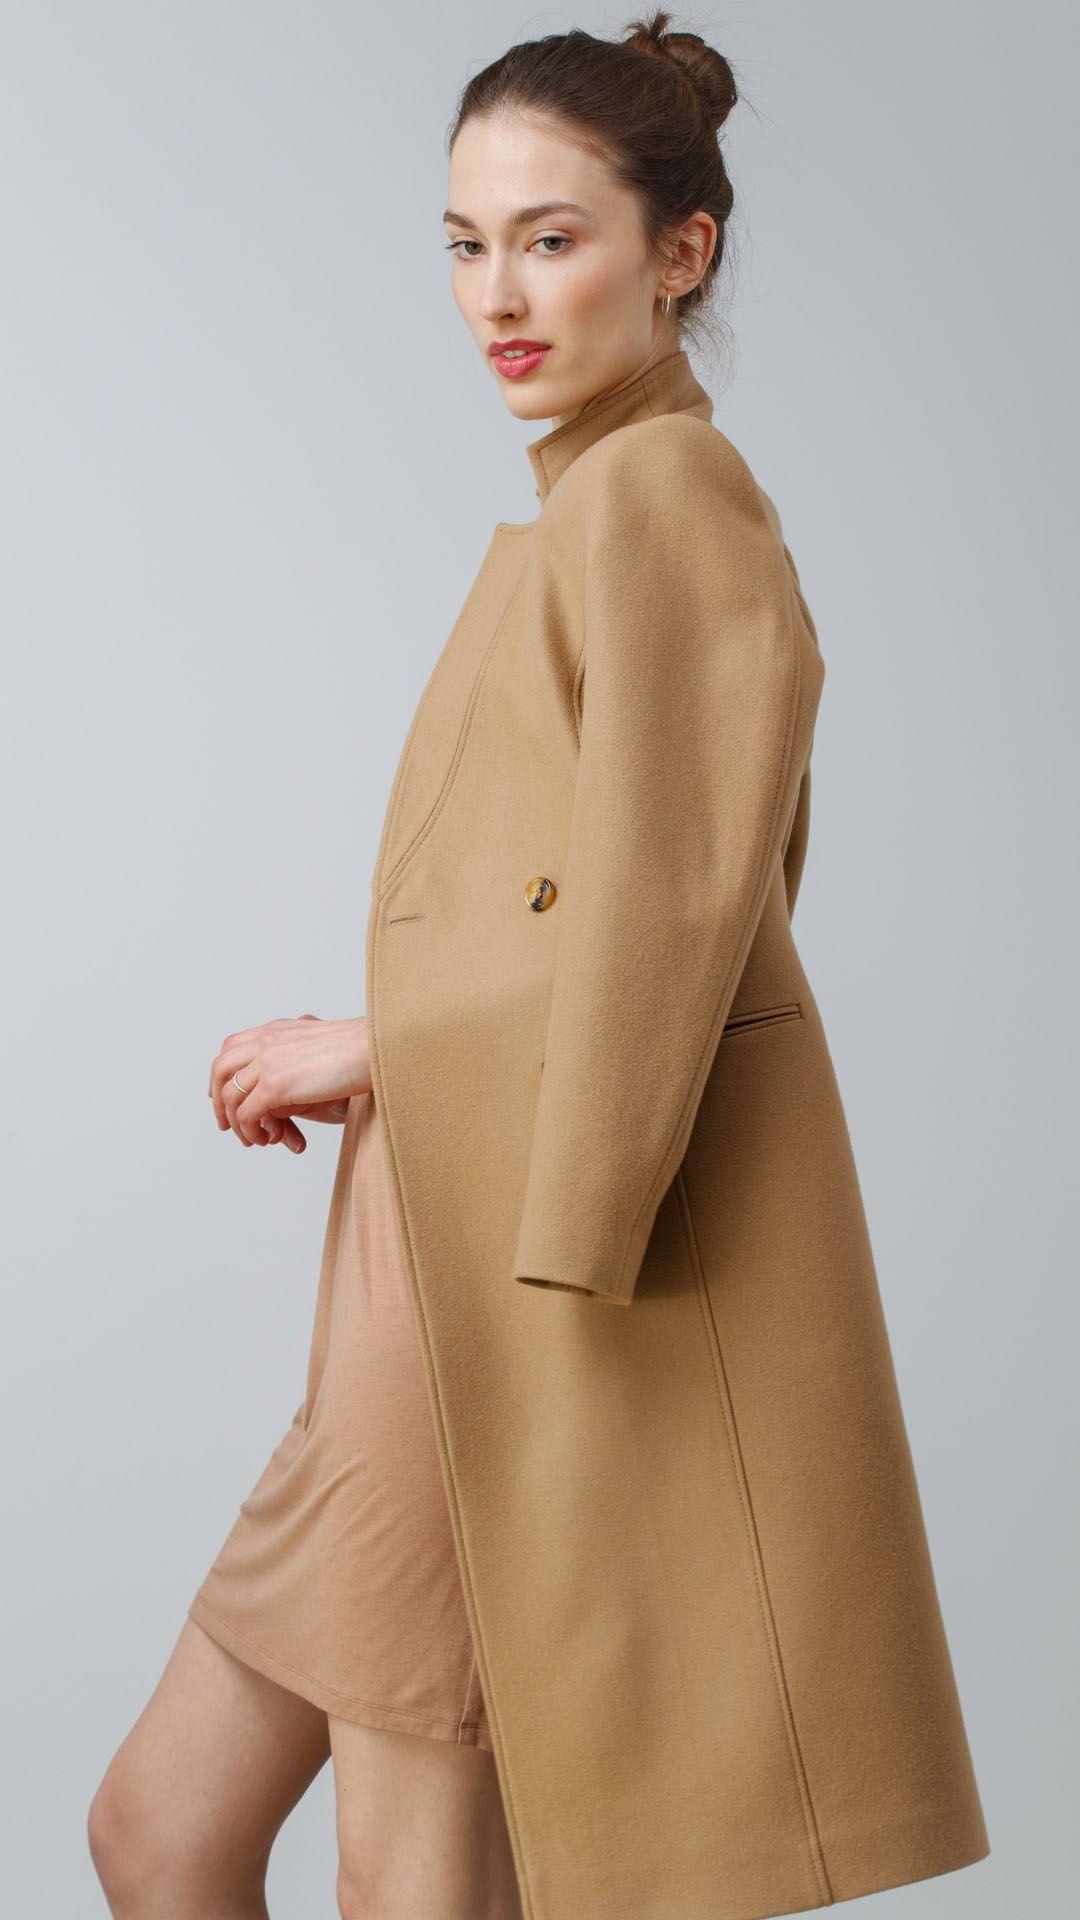 Pin on Alpaca wool coats FG atelier